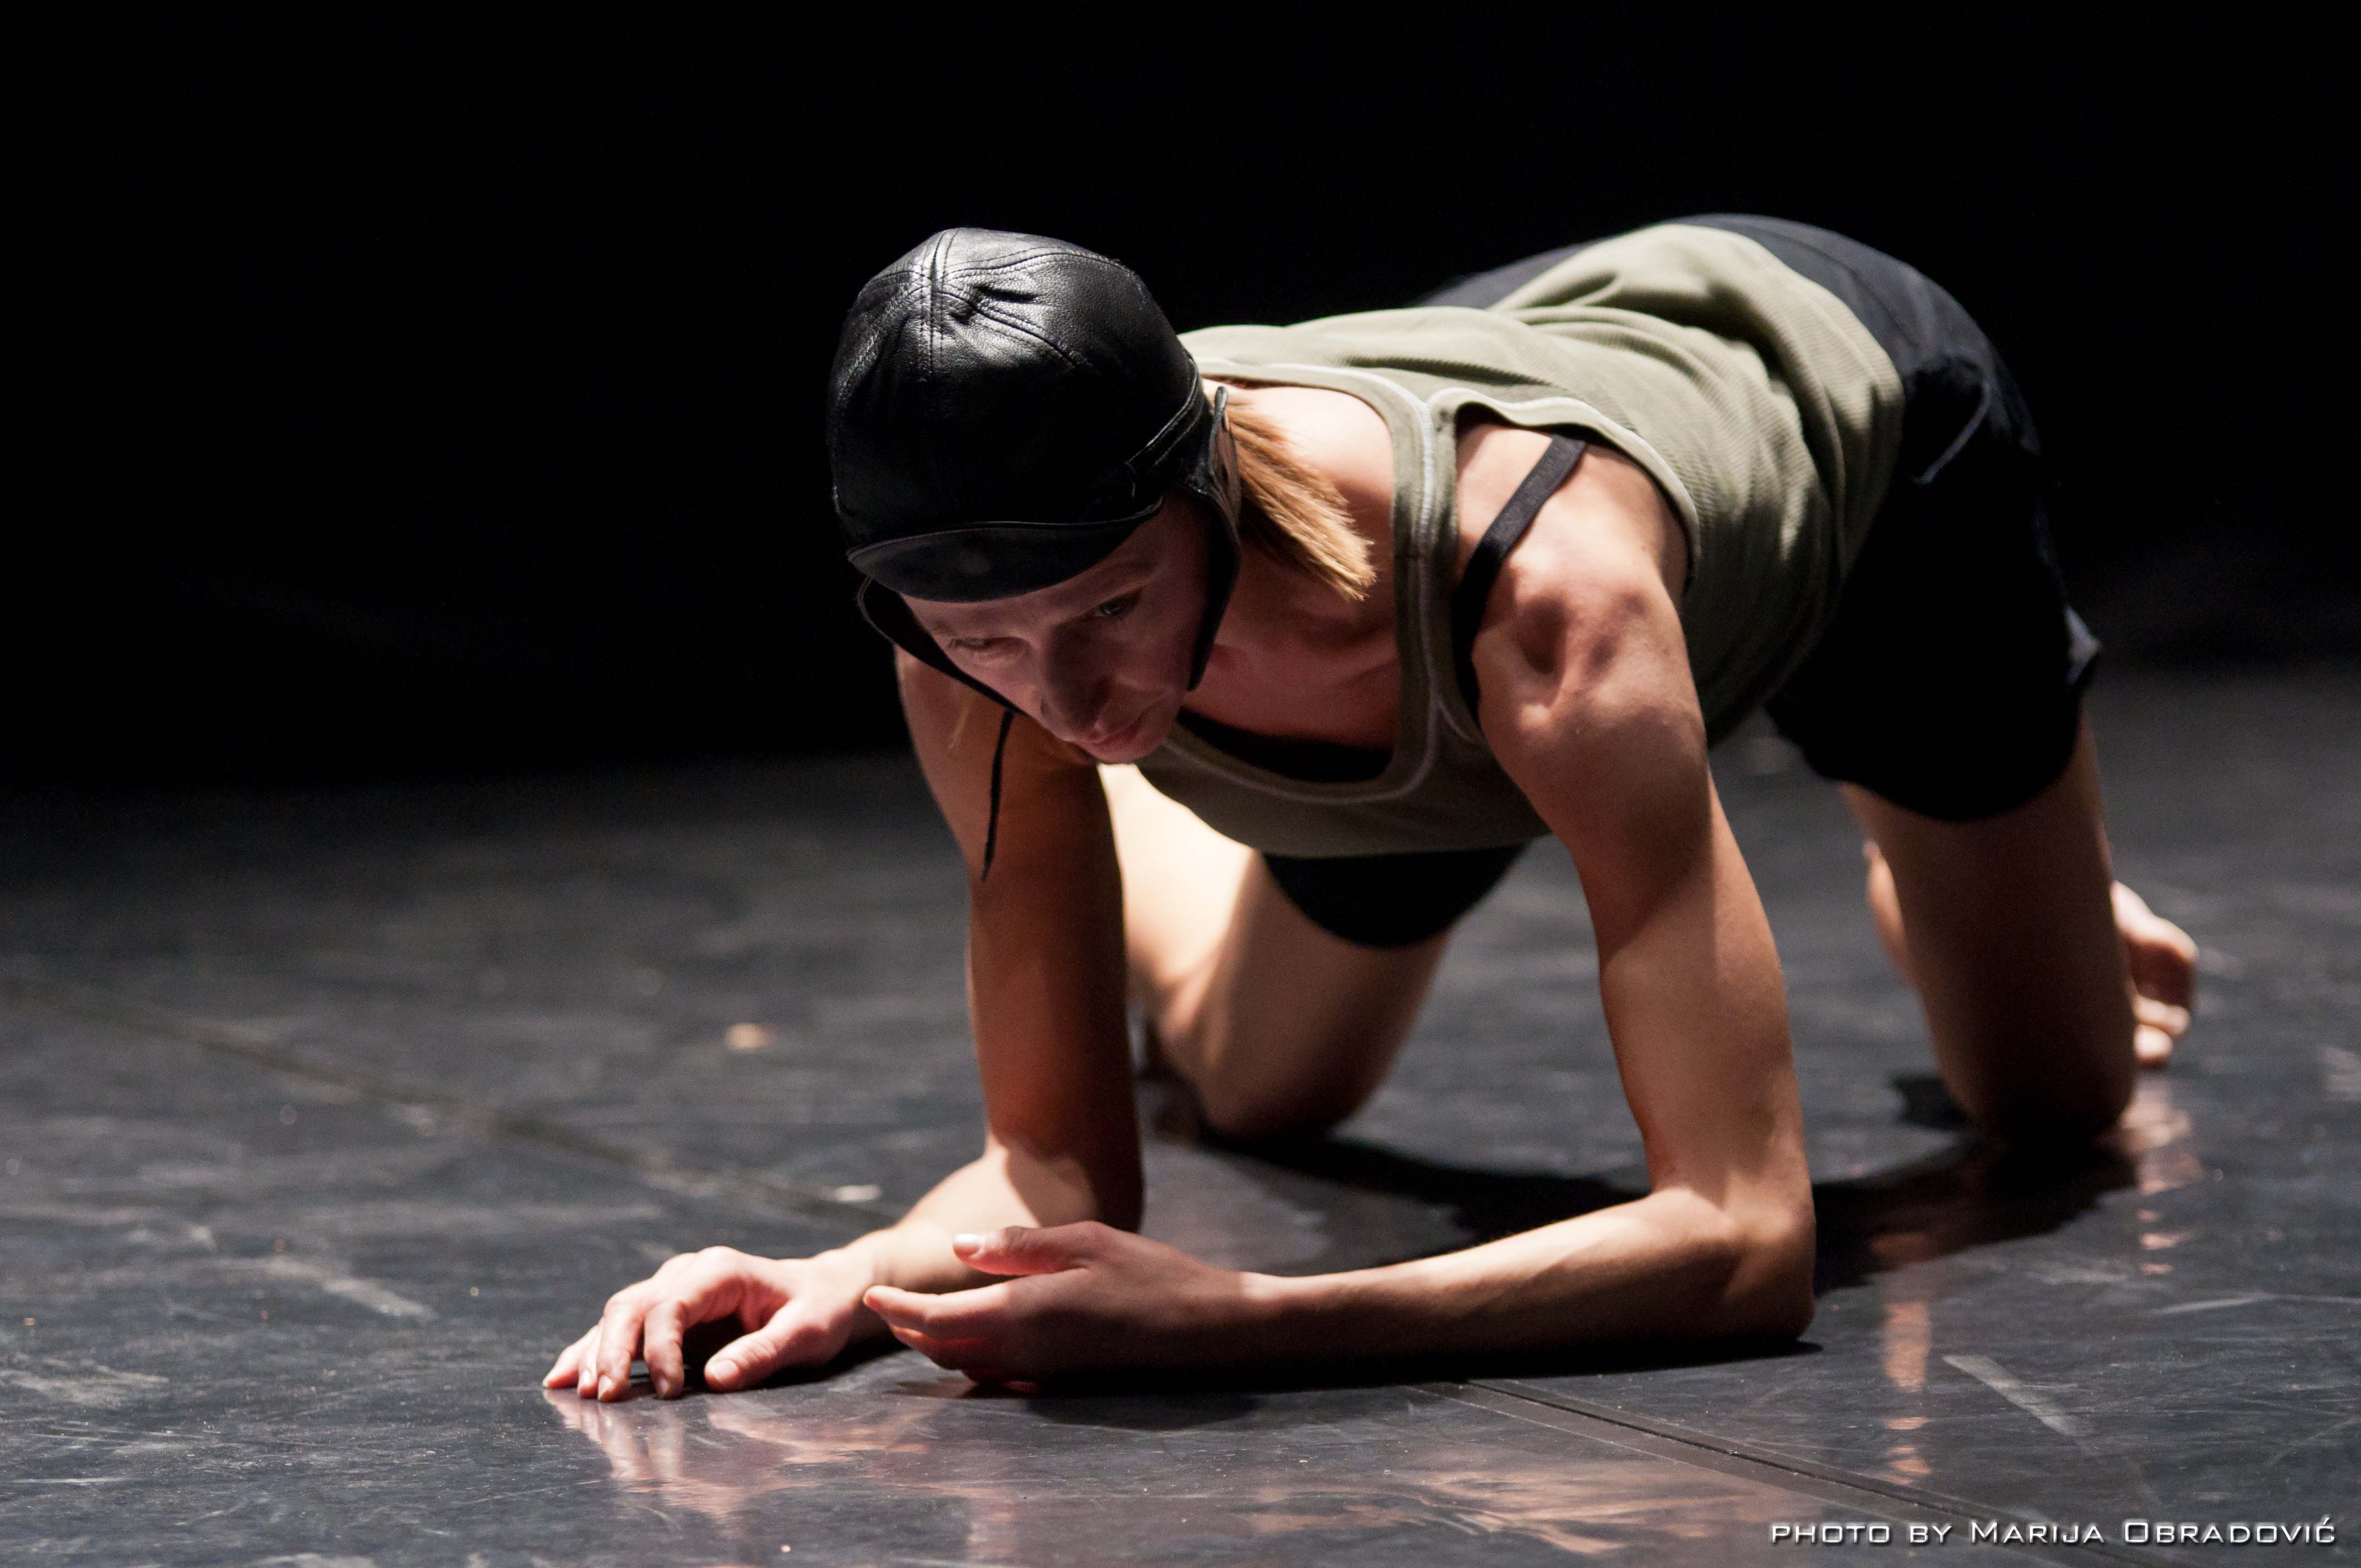 Simona Bertozzi Bird's eye view. Appunti coreografici per Mimicry – photo Marija Obradovic